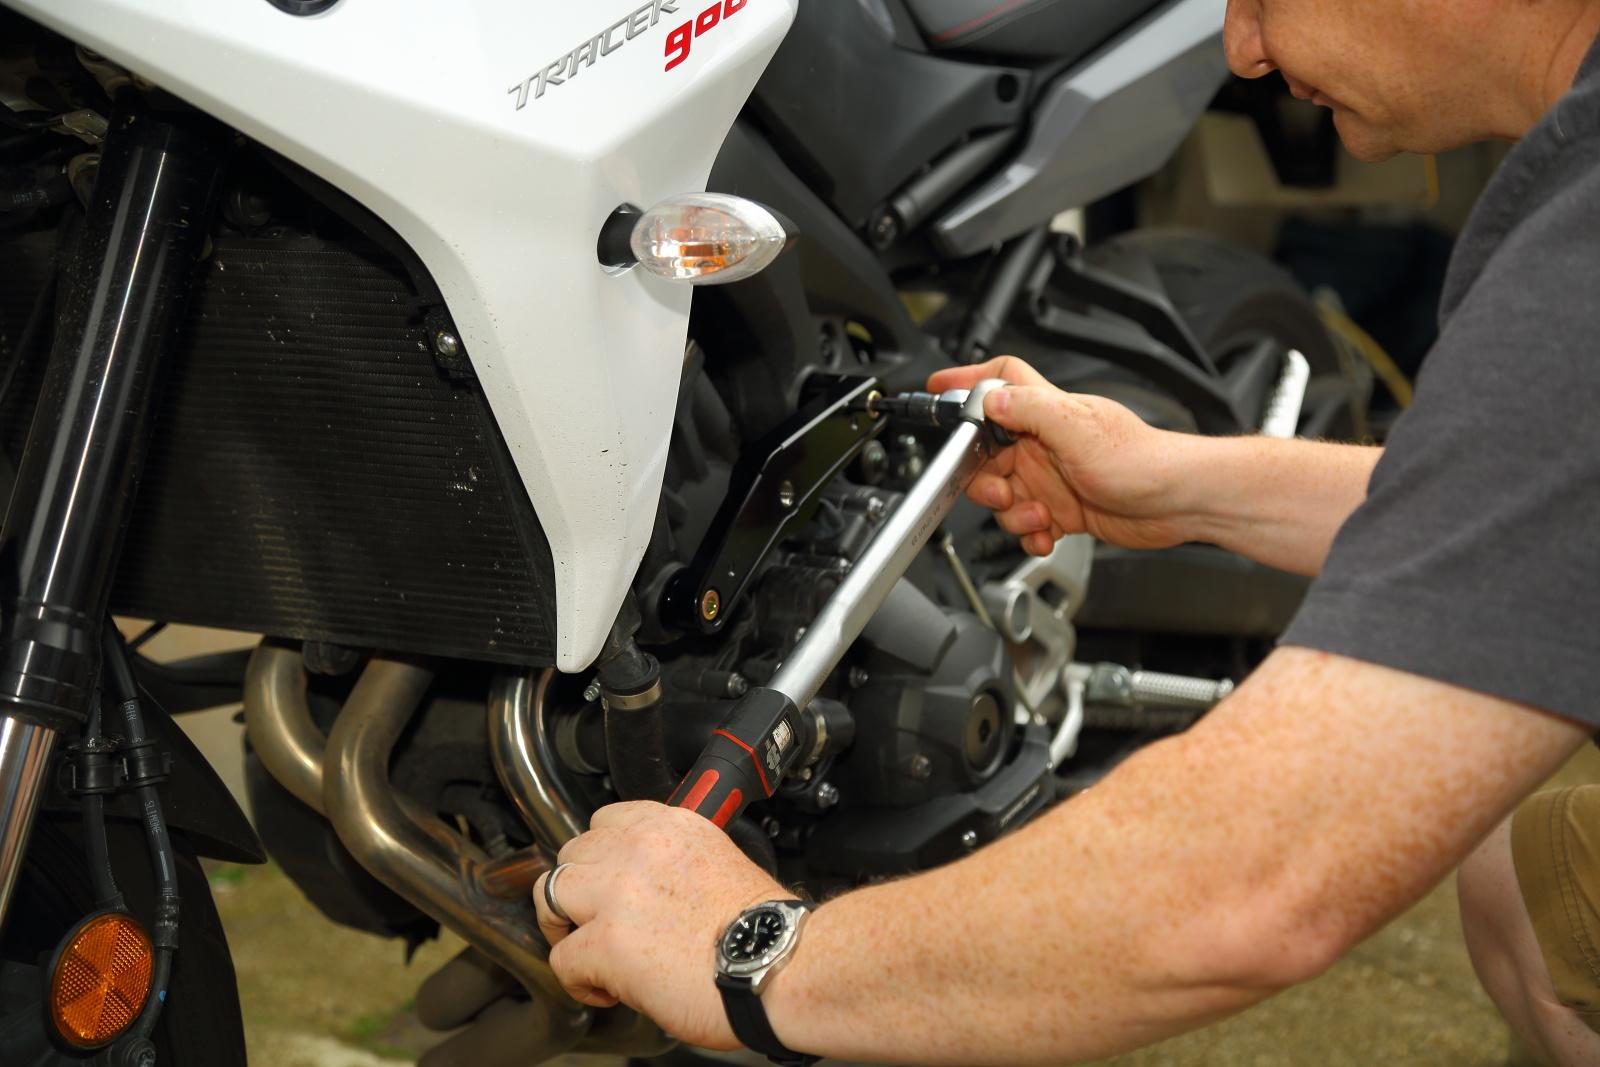 R&G crash protectors for Yamaha Tracer 900